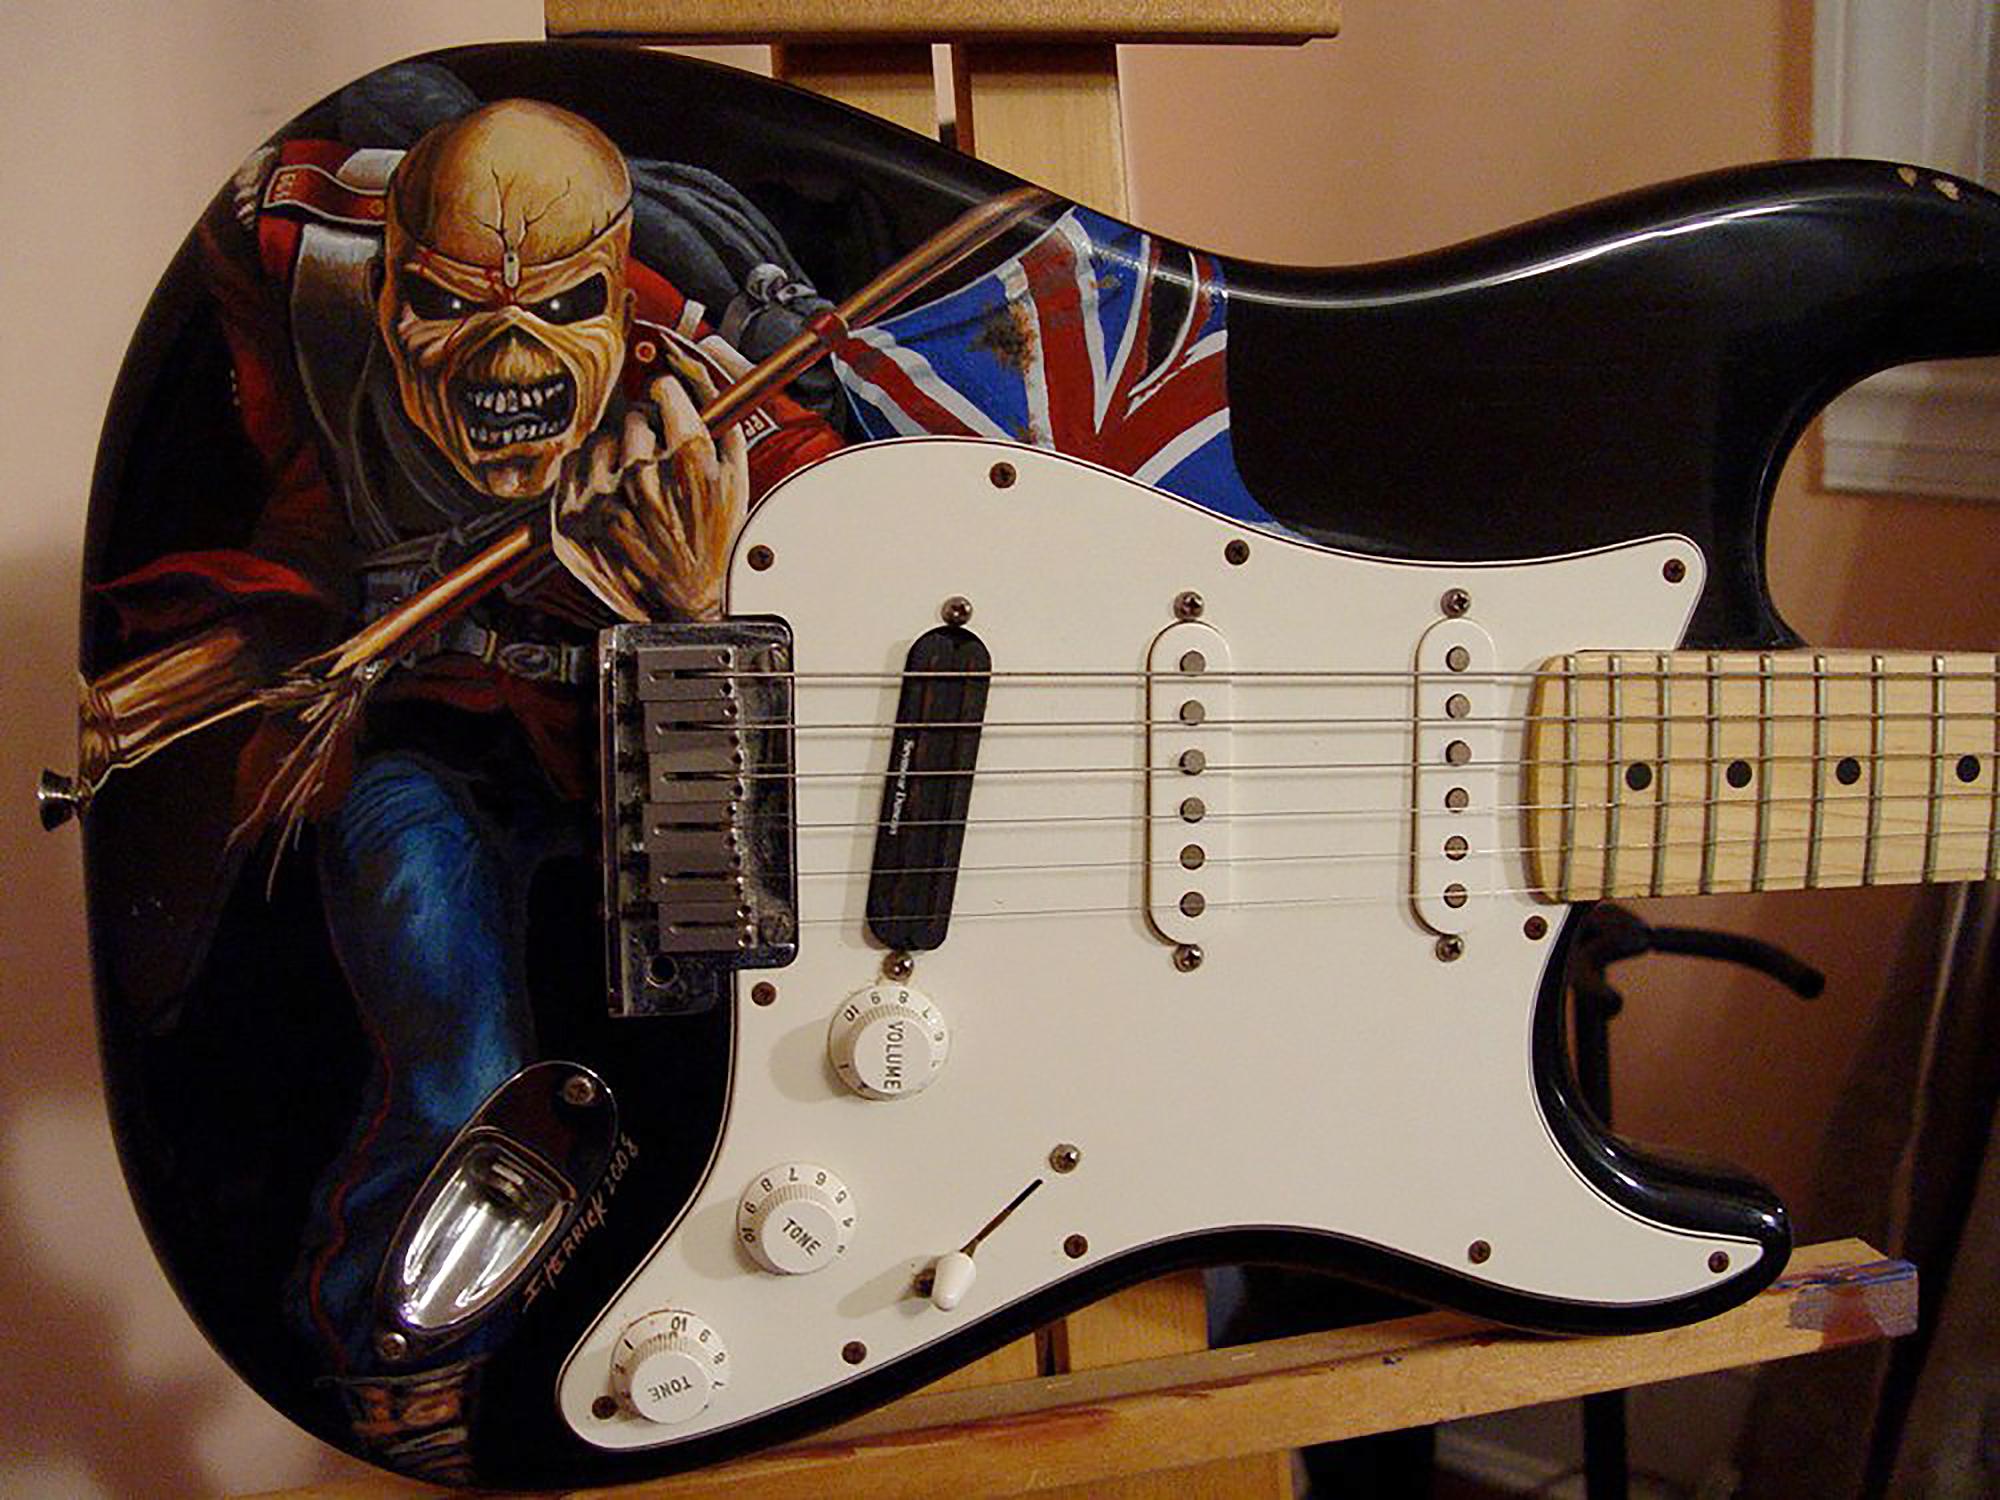 Iron Maiden - 'The Trooper' detail